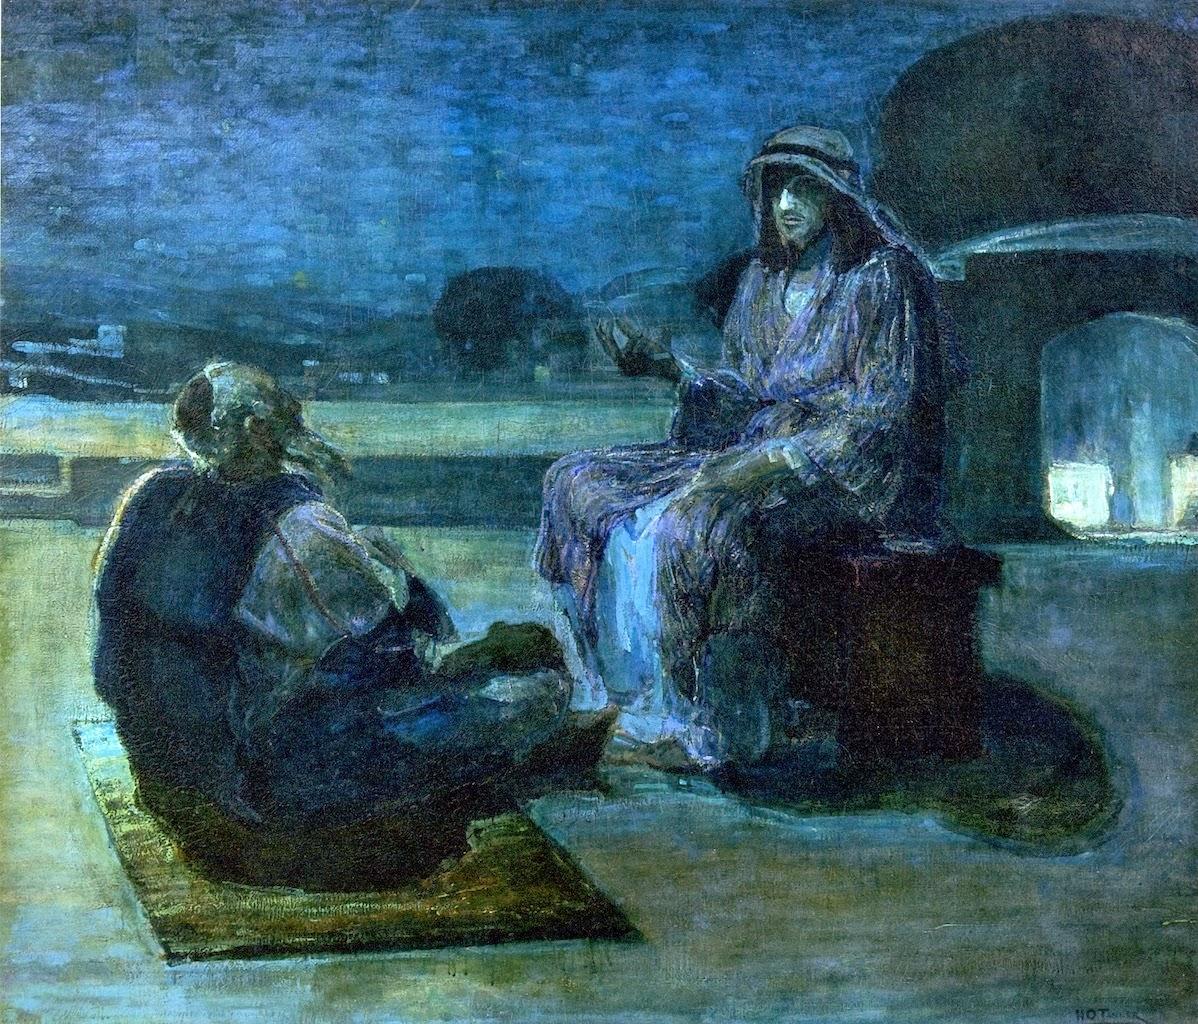 Henry Ossawa Tanner, Gesù e Nicodemo, olio su tela, 1927